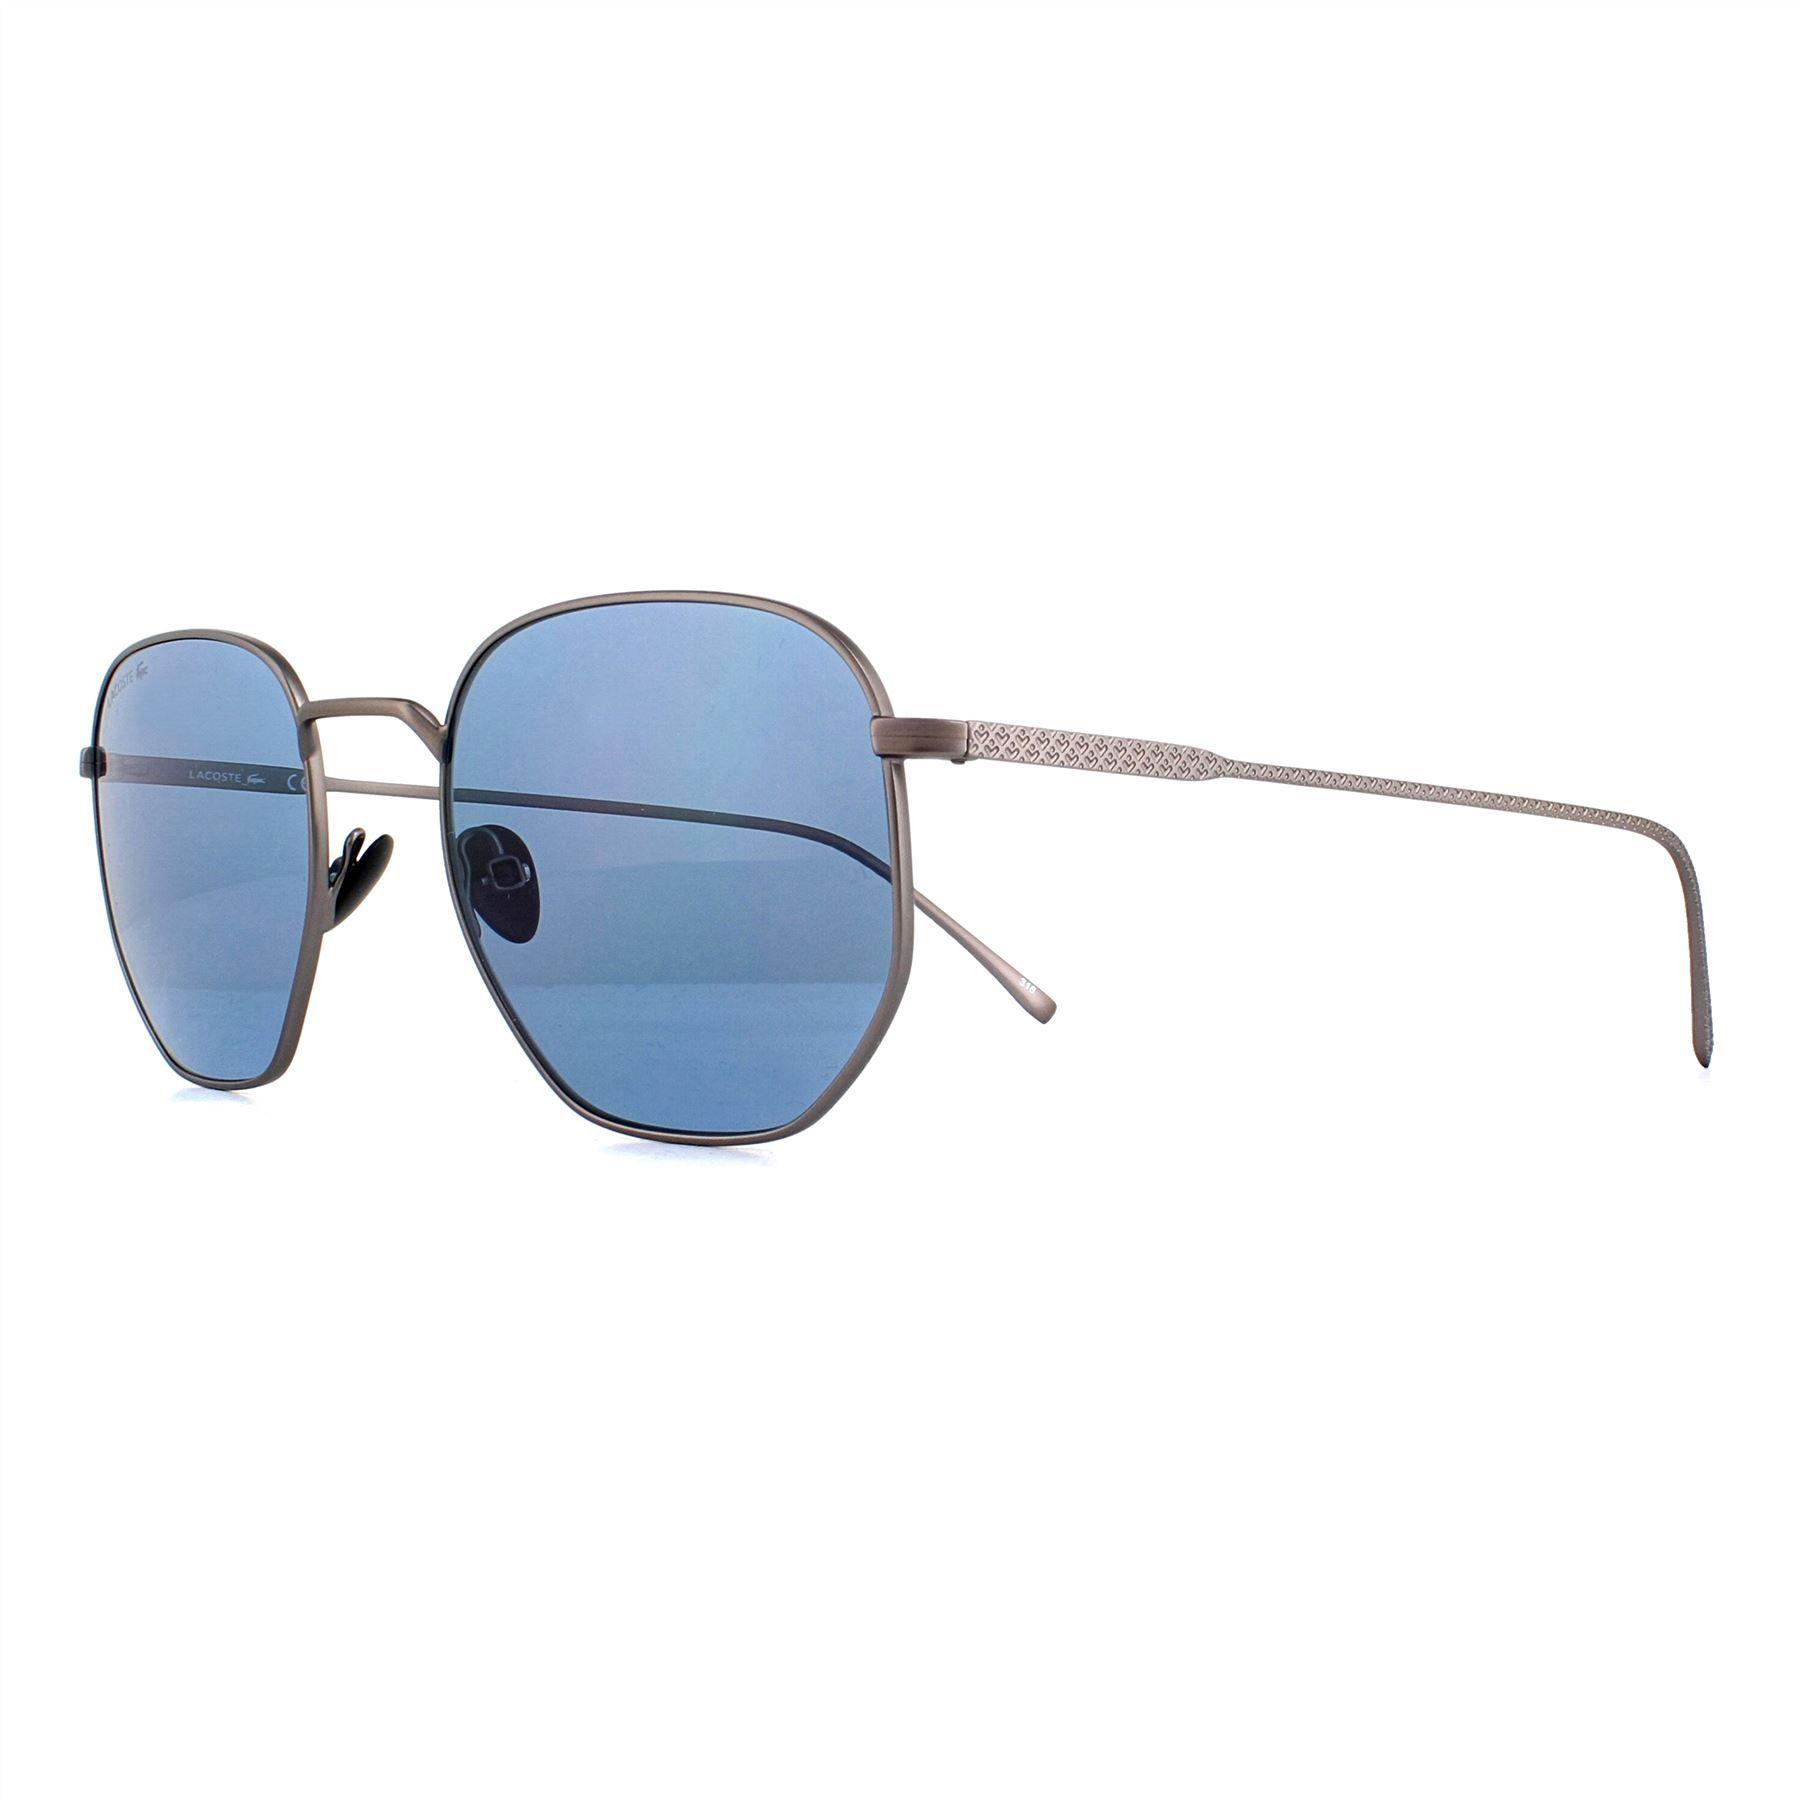 Lacoste Sunglasses L206S 033 Matte Dark Ruthenium Blue